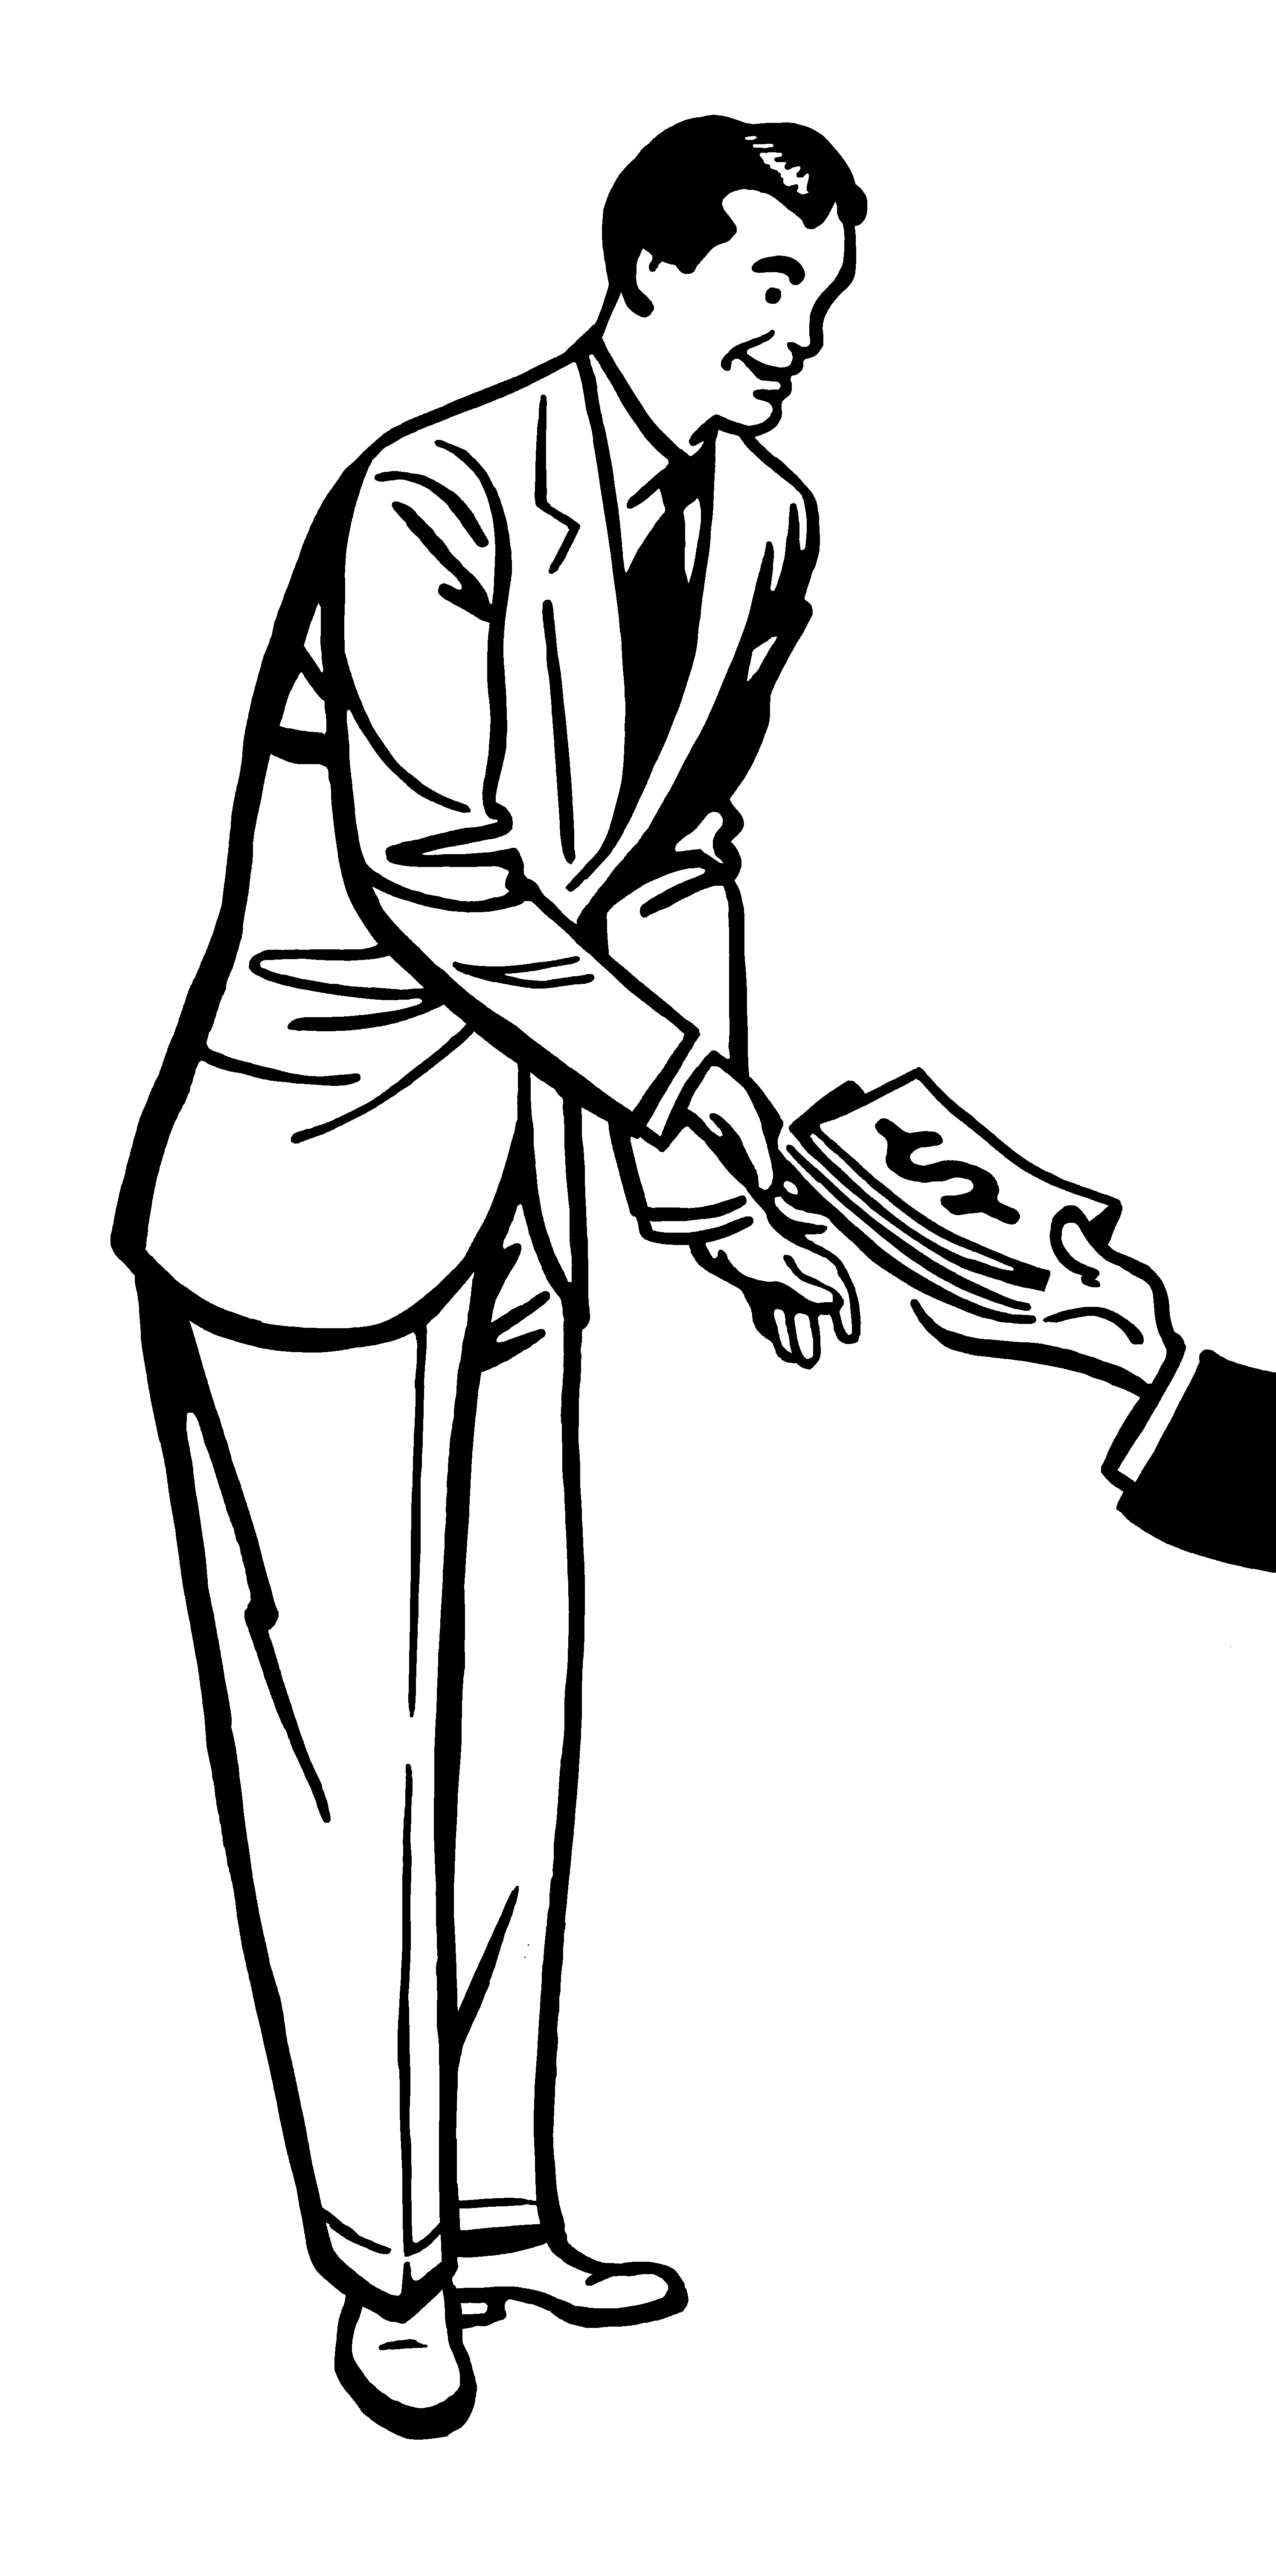 Man Receiving Money